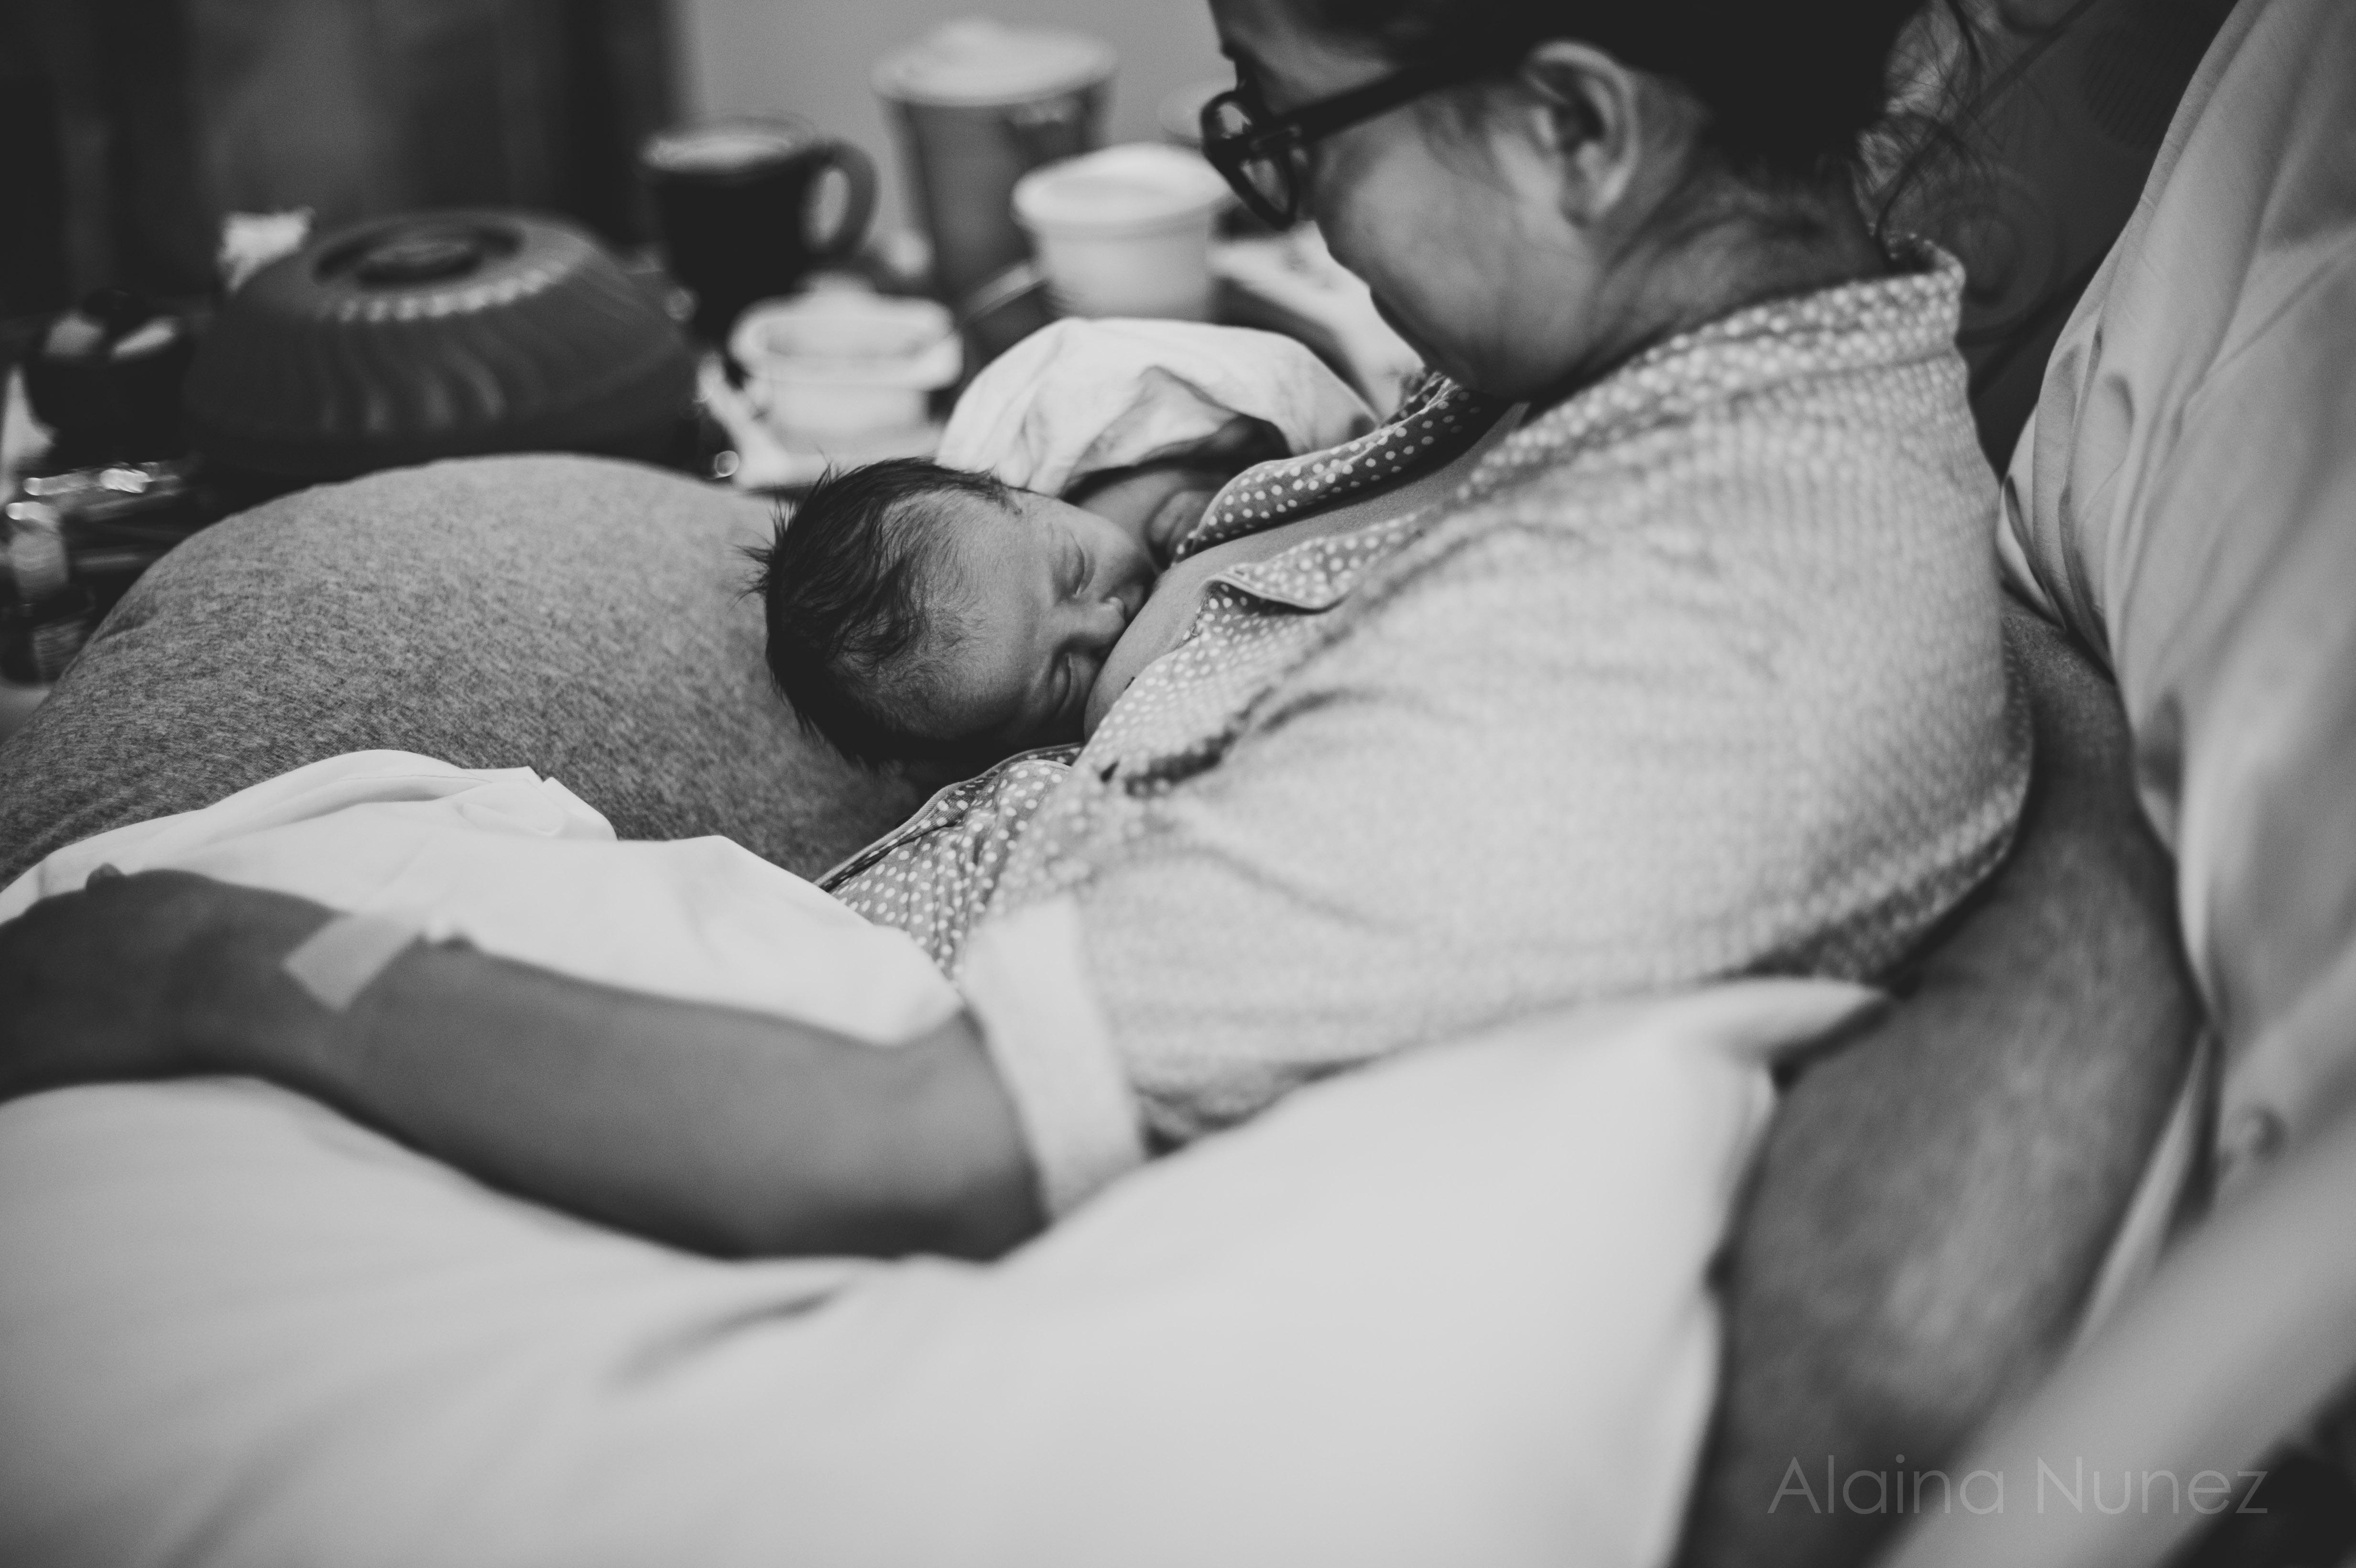 alainanunezphotography.birth.freshbaby-93